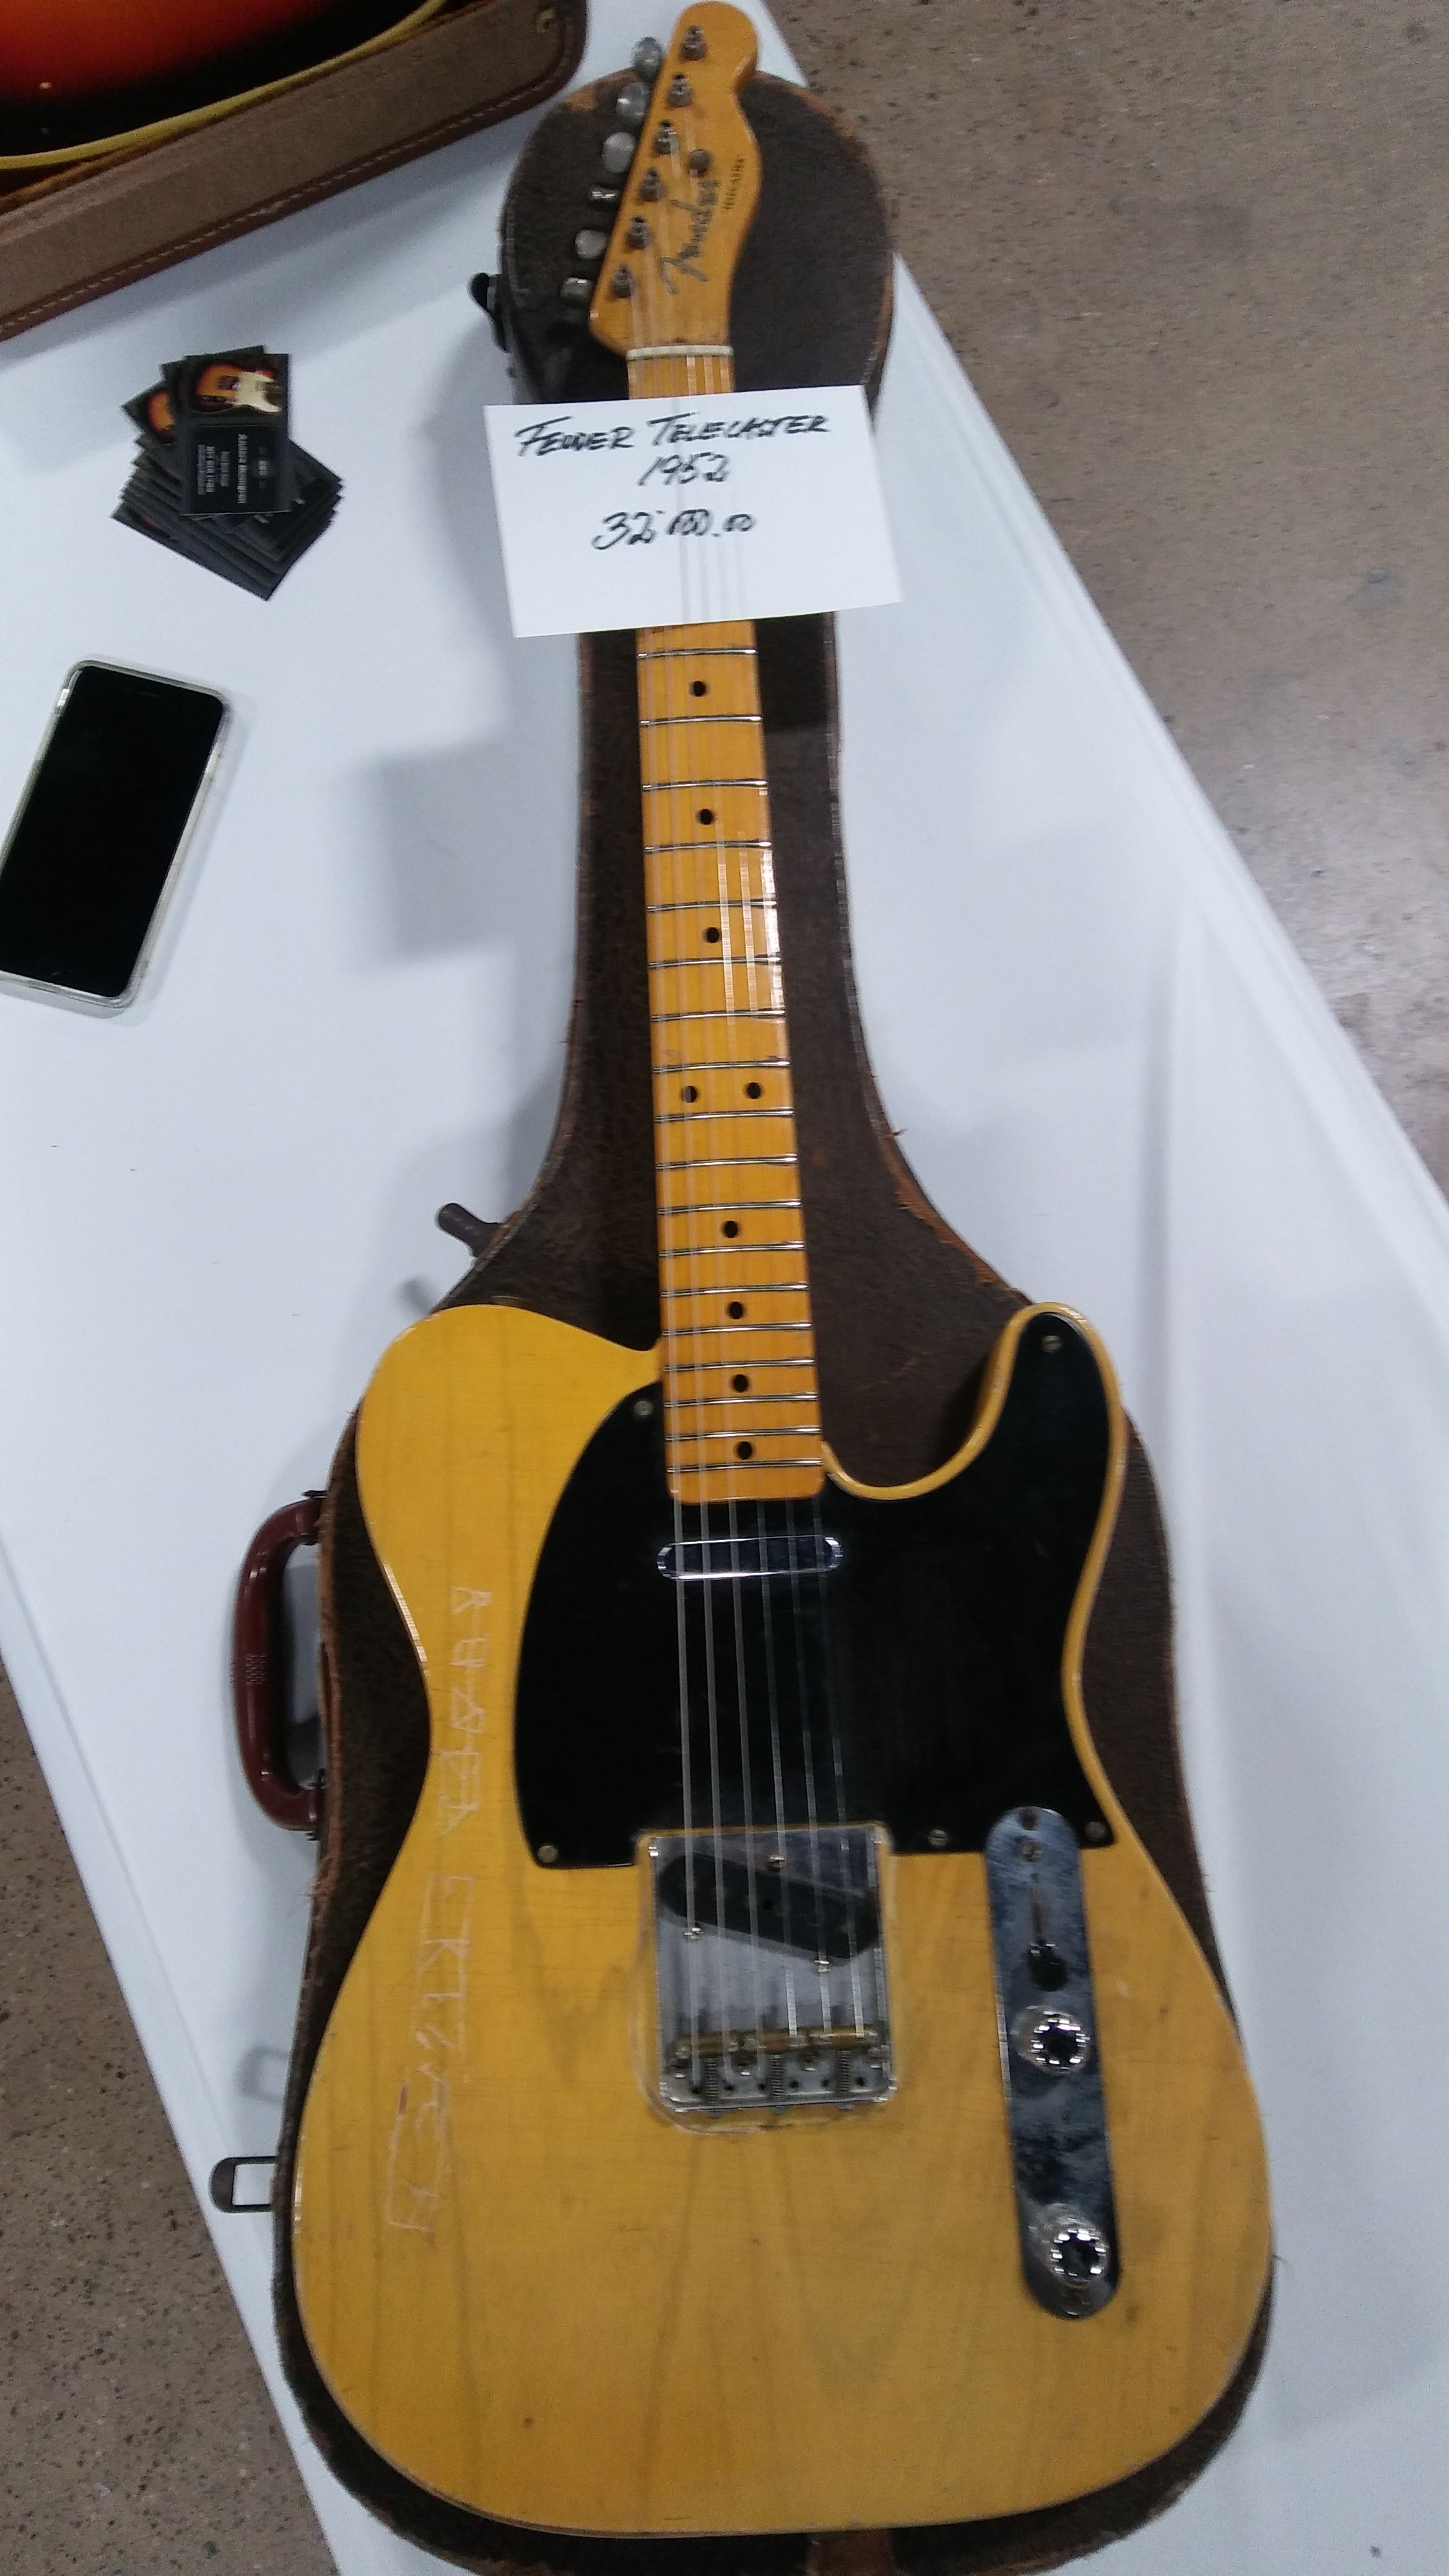 1952 Fender Telecaster Guitar Fender Guitar Fender Guitars Fender Vintage